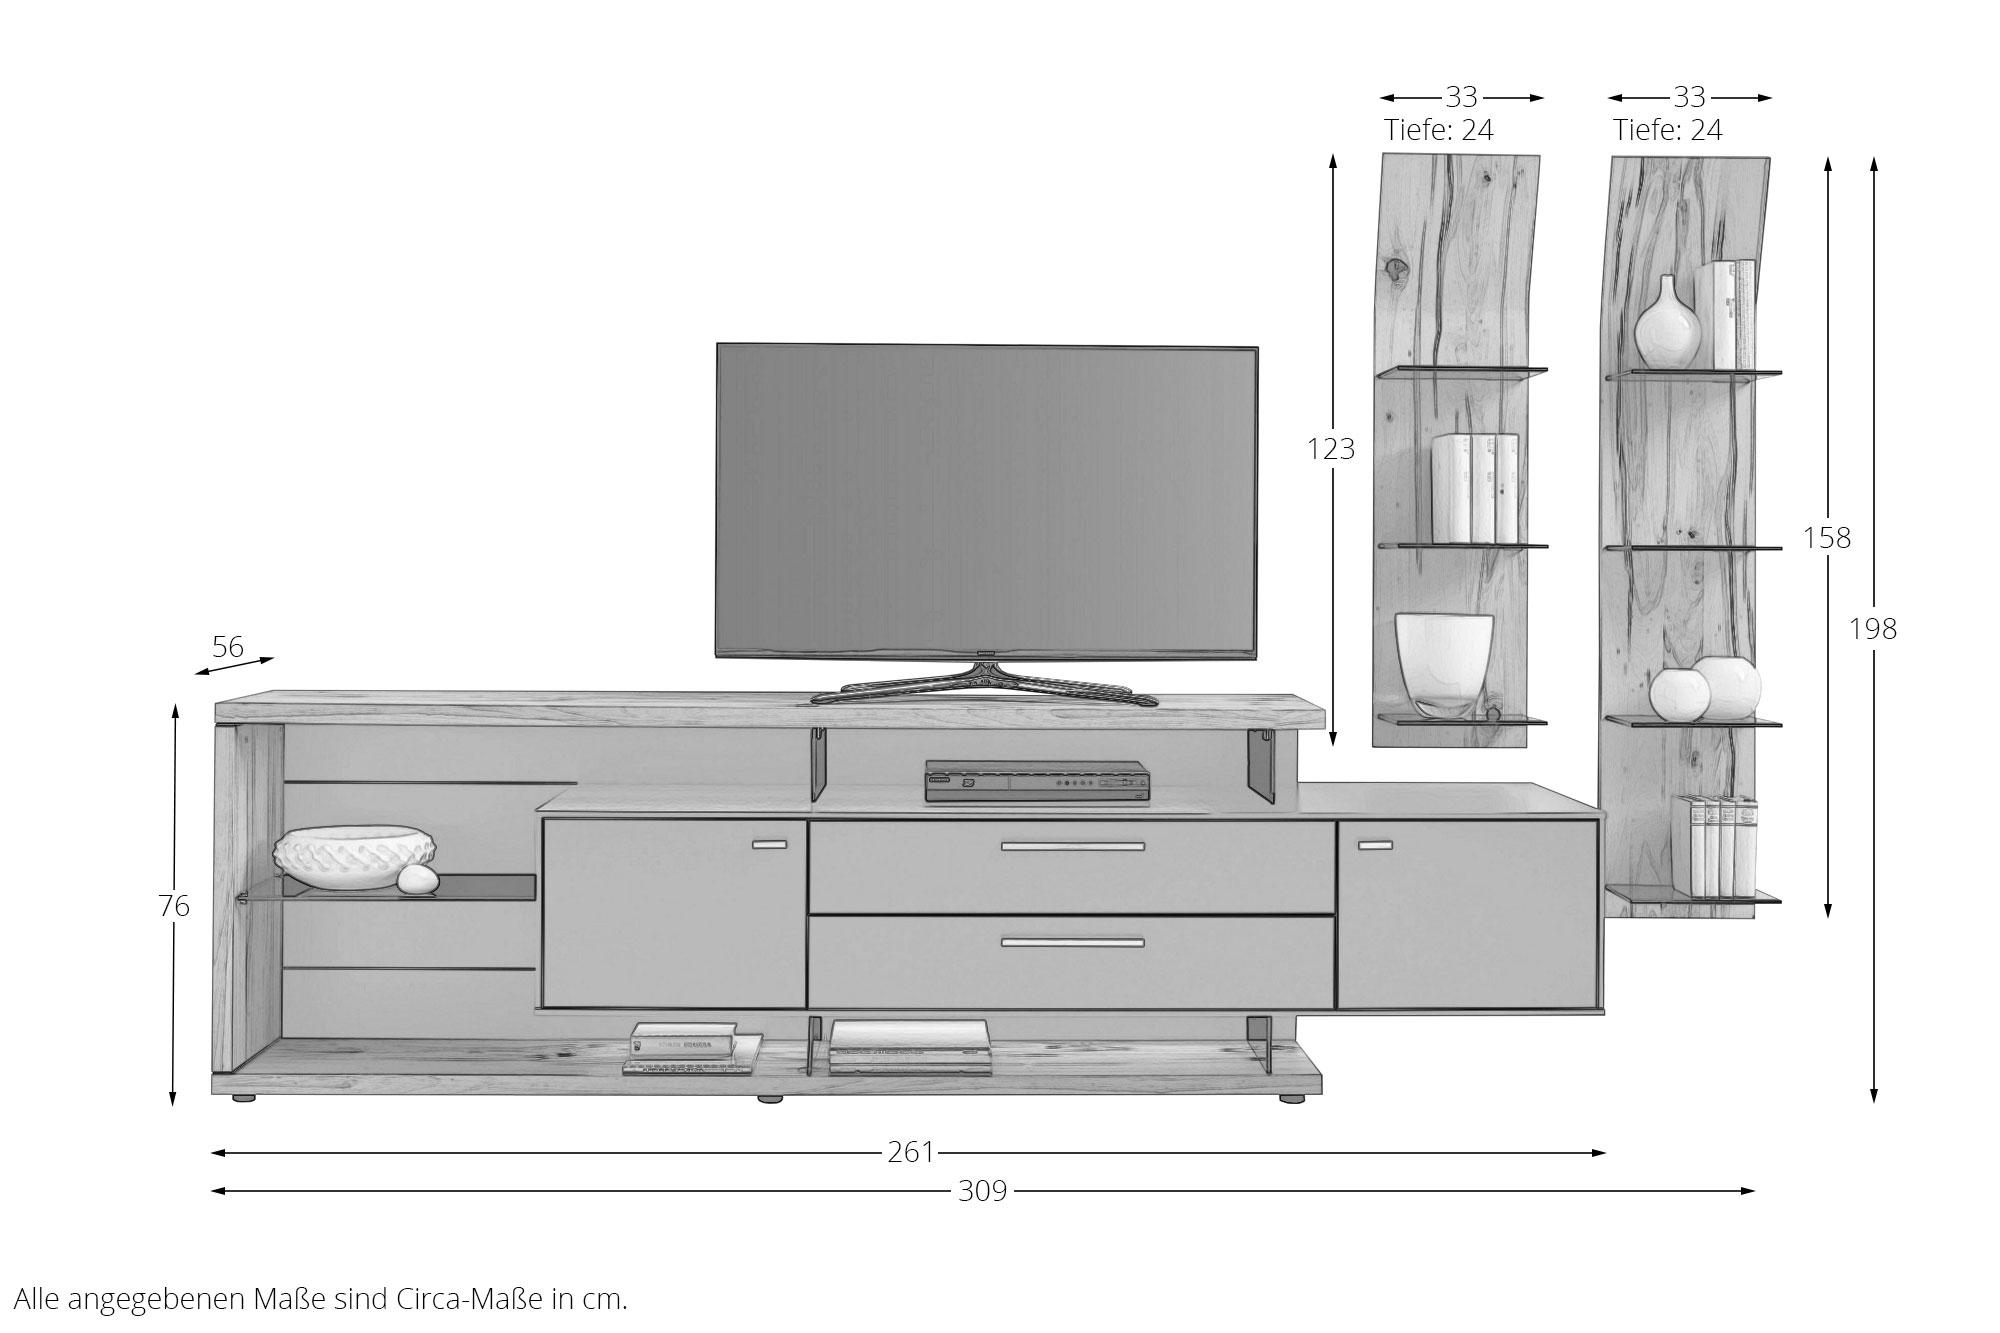 HD Wallpapers Wohnzimmer Planen Online Kostenlos Hhddesktopwallbml - Wohnzimmer planen online kostenlos